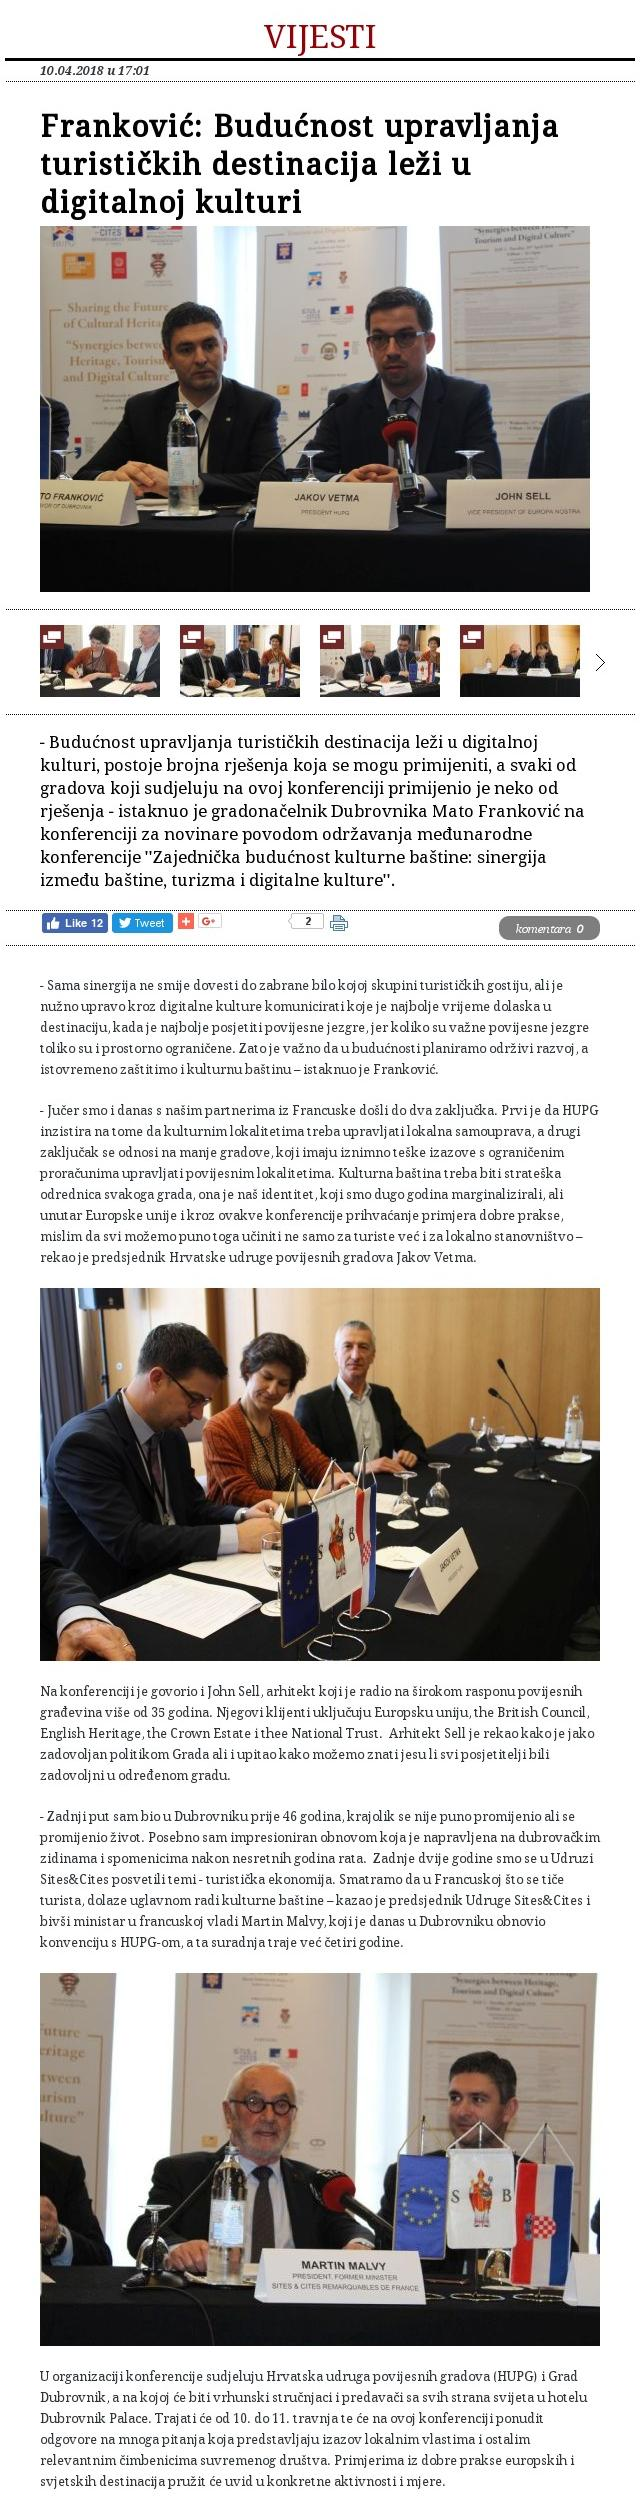 HUPG konferencija 2018 - objava na dubrovniknet.hr